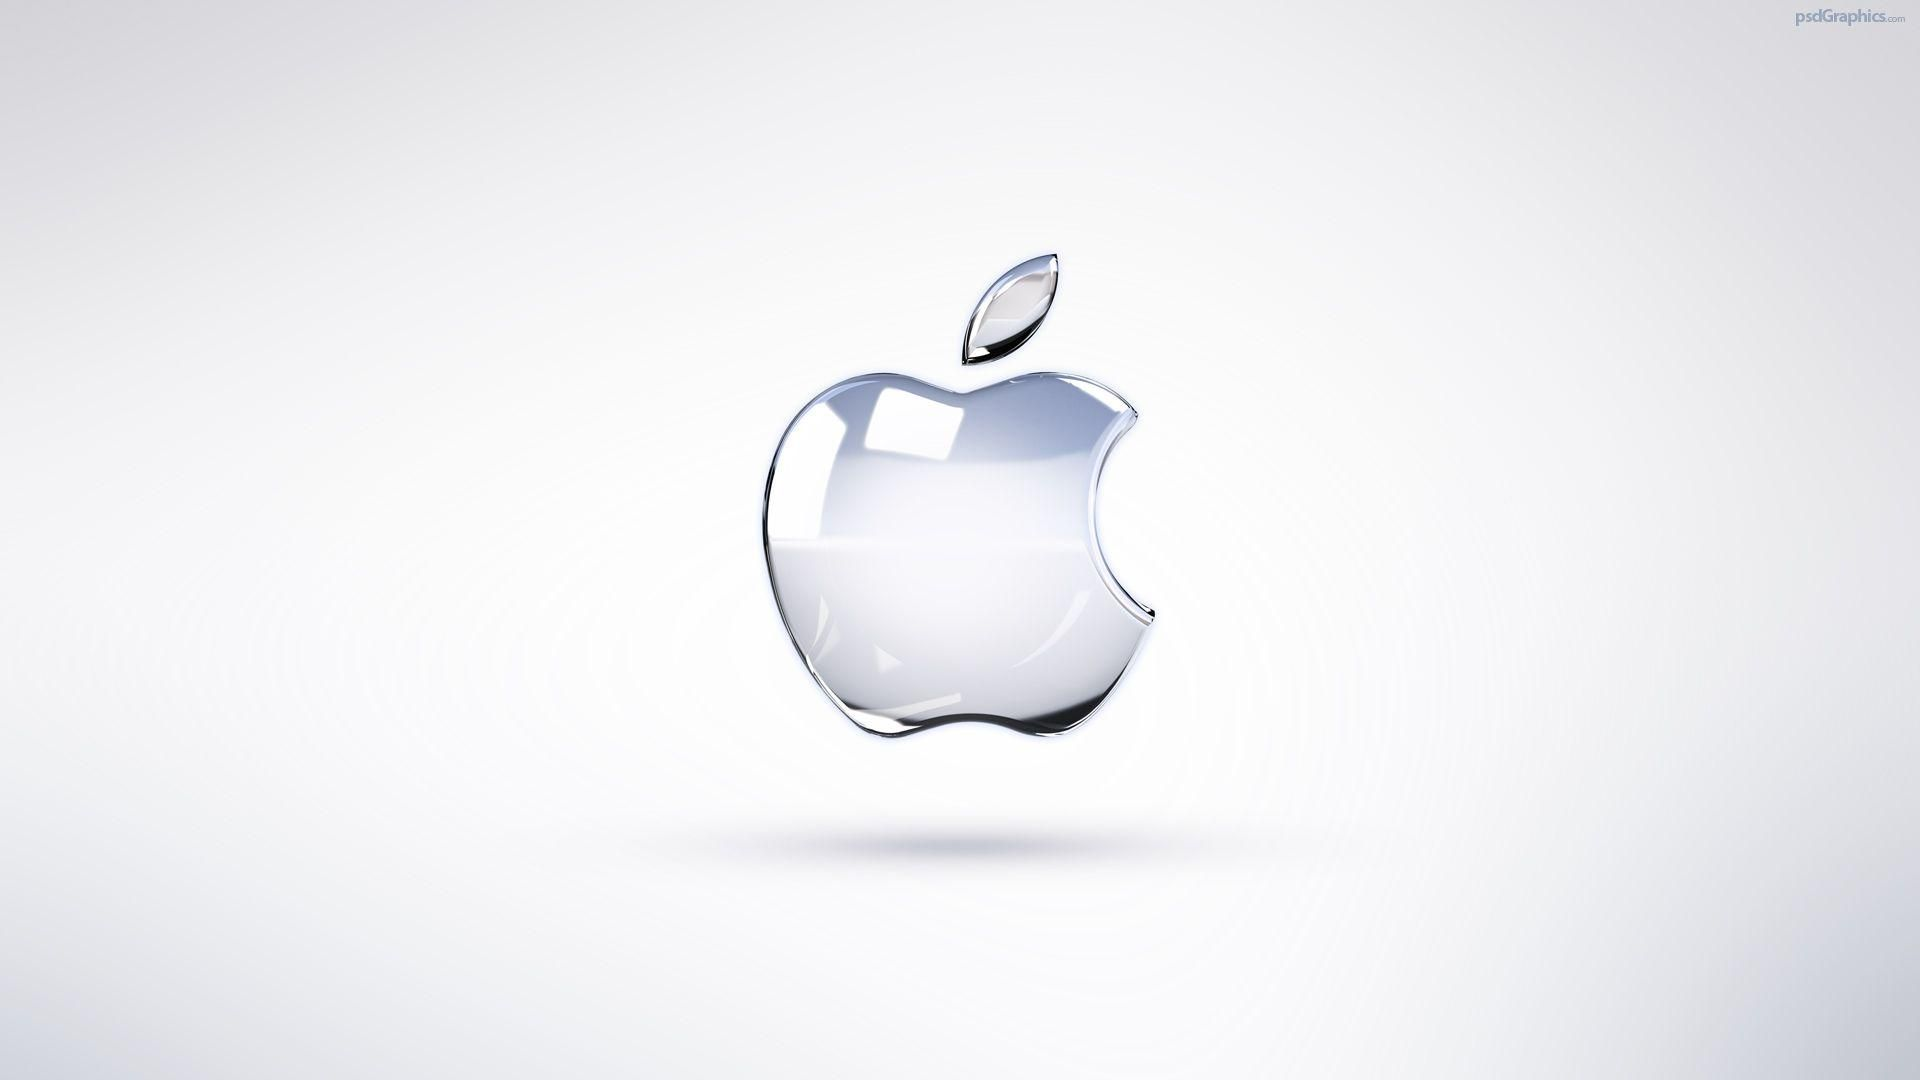 Wallpapers Hd For Apple Apple Logo Gambar Iphone